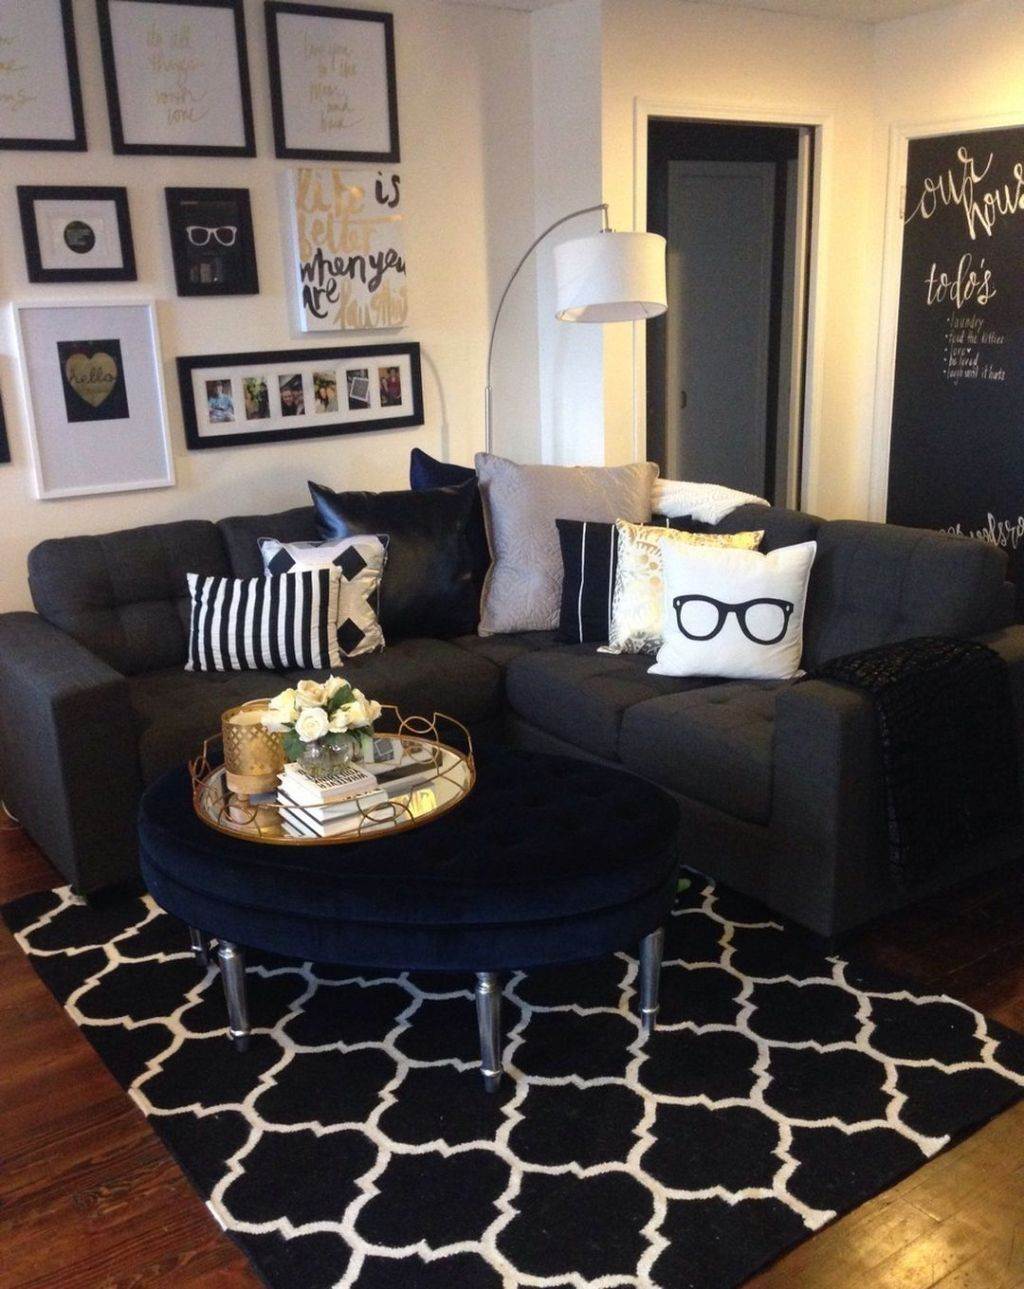 41 Wonderful DIY Apartment On a Budget